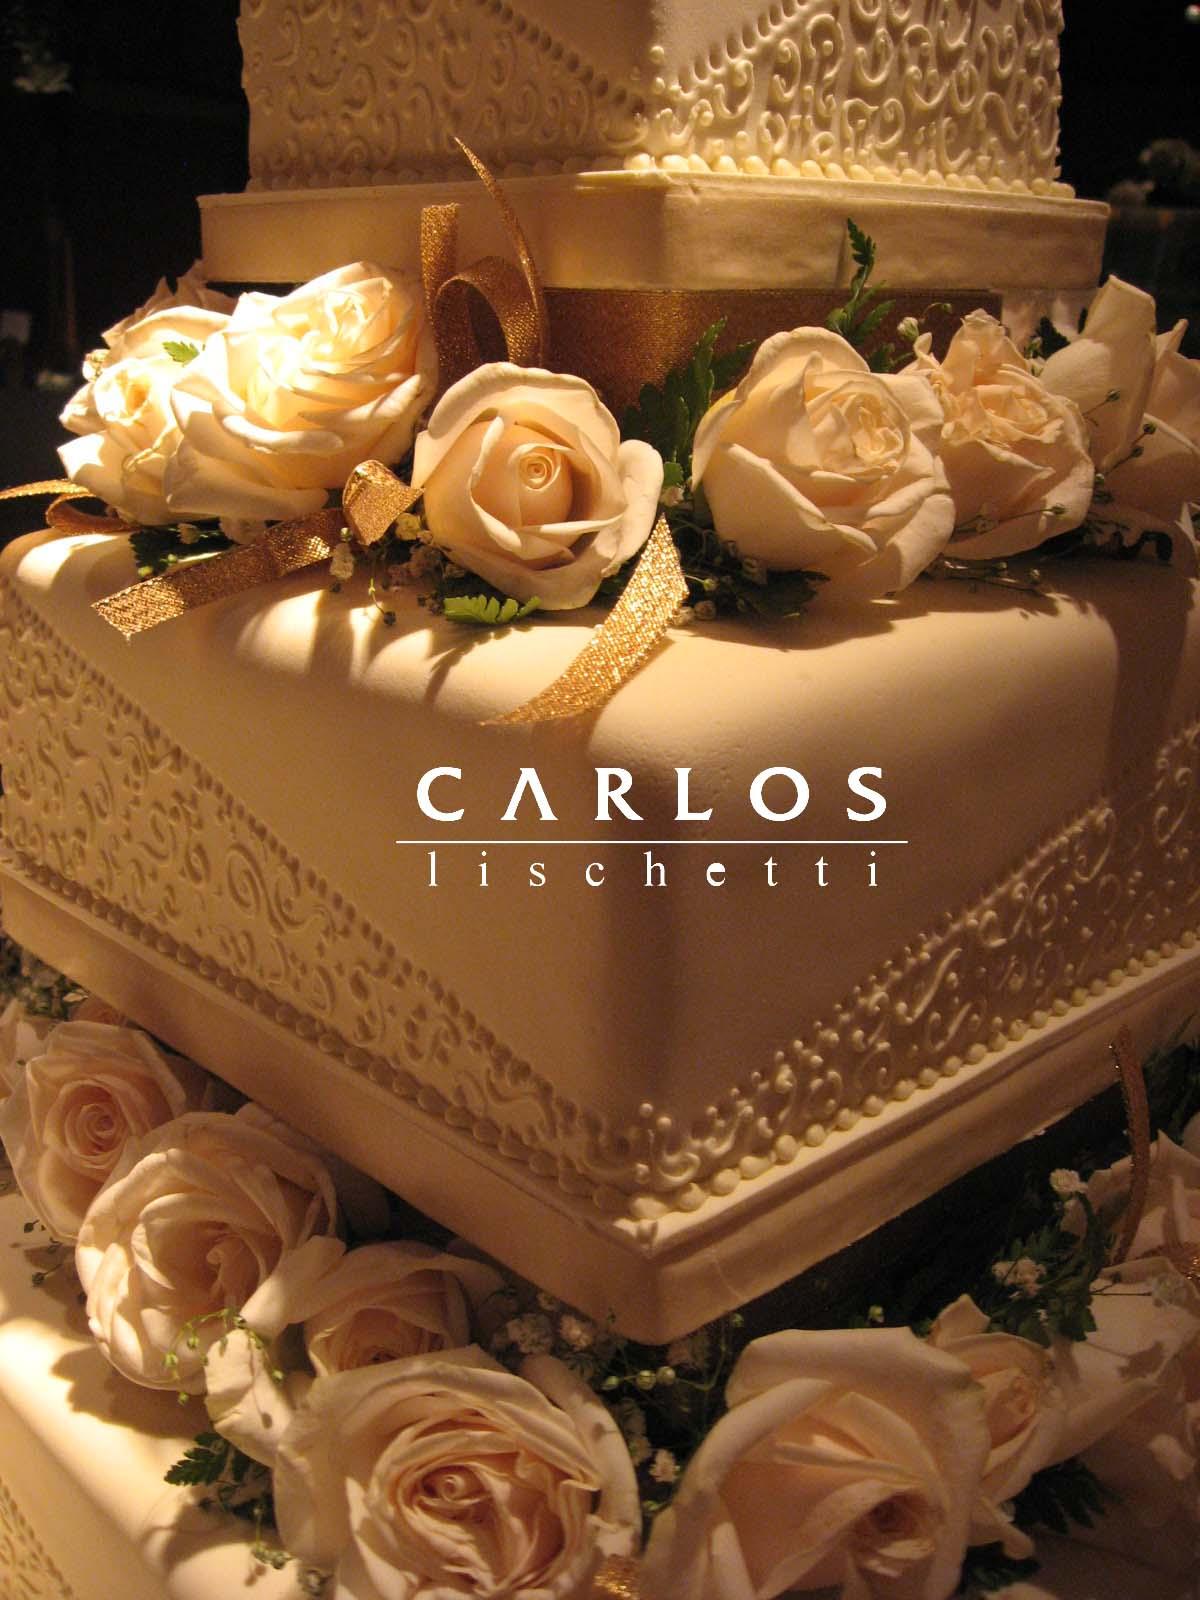 Carlos Lischetti: CAKES